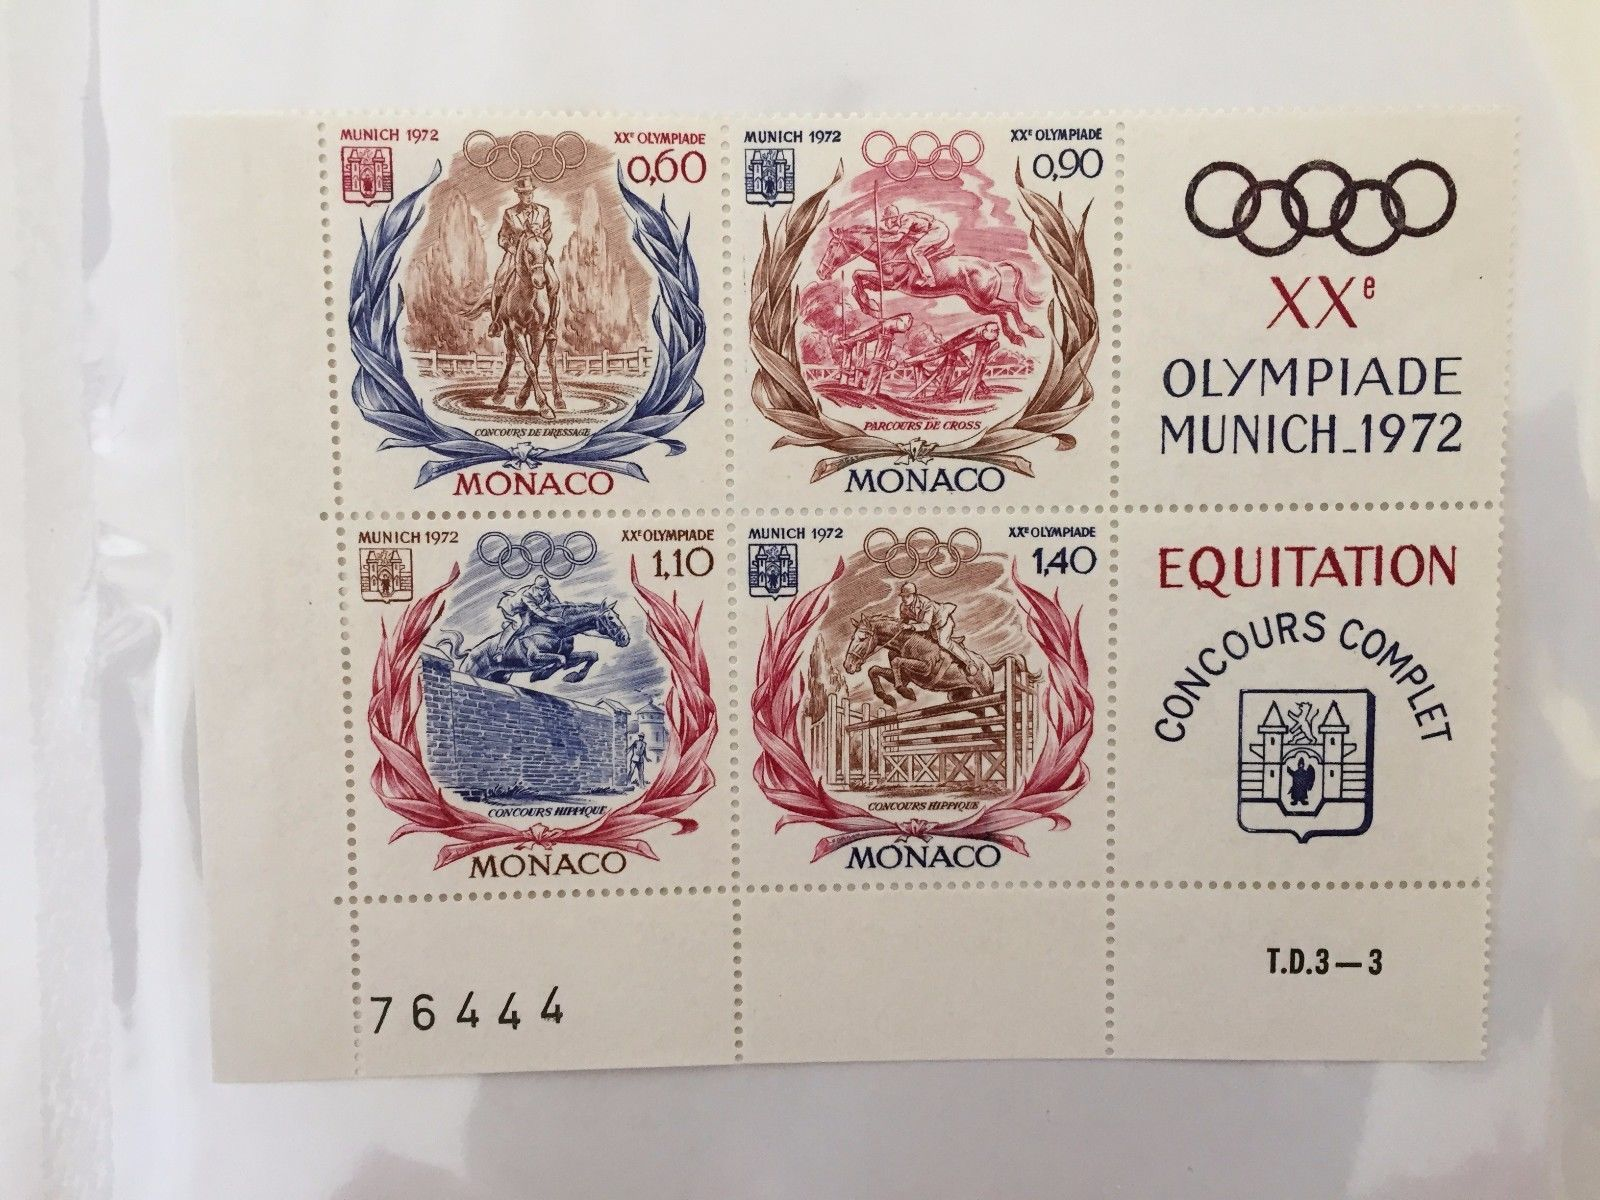 F98 Monaco Souvenir Stamps Rainier Louis Munich Olympics 1972 Europa 1976 1984